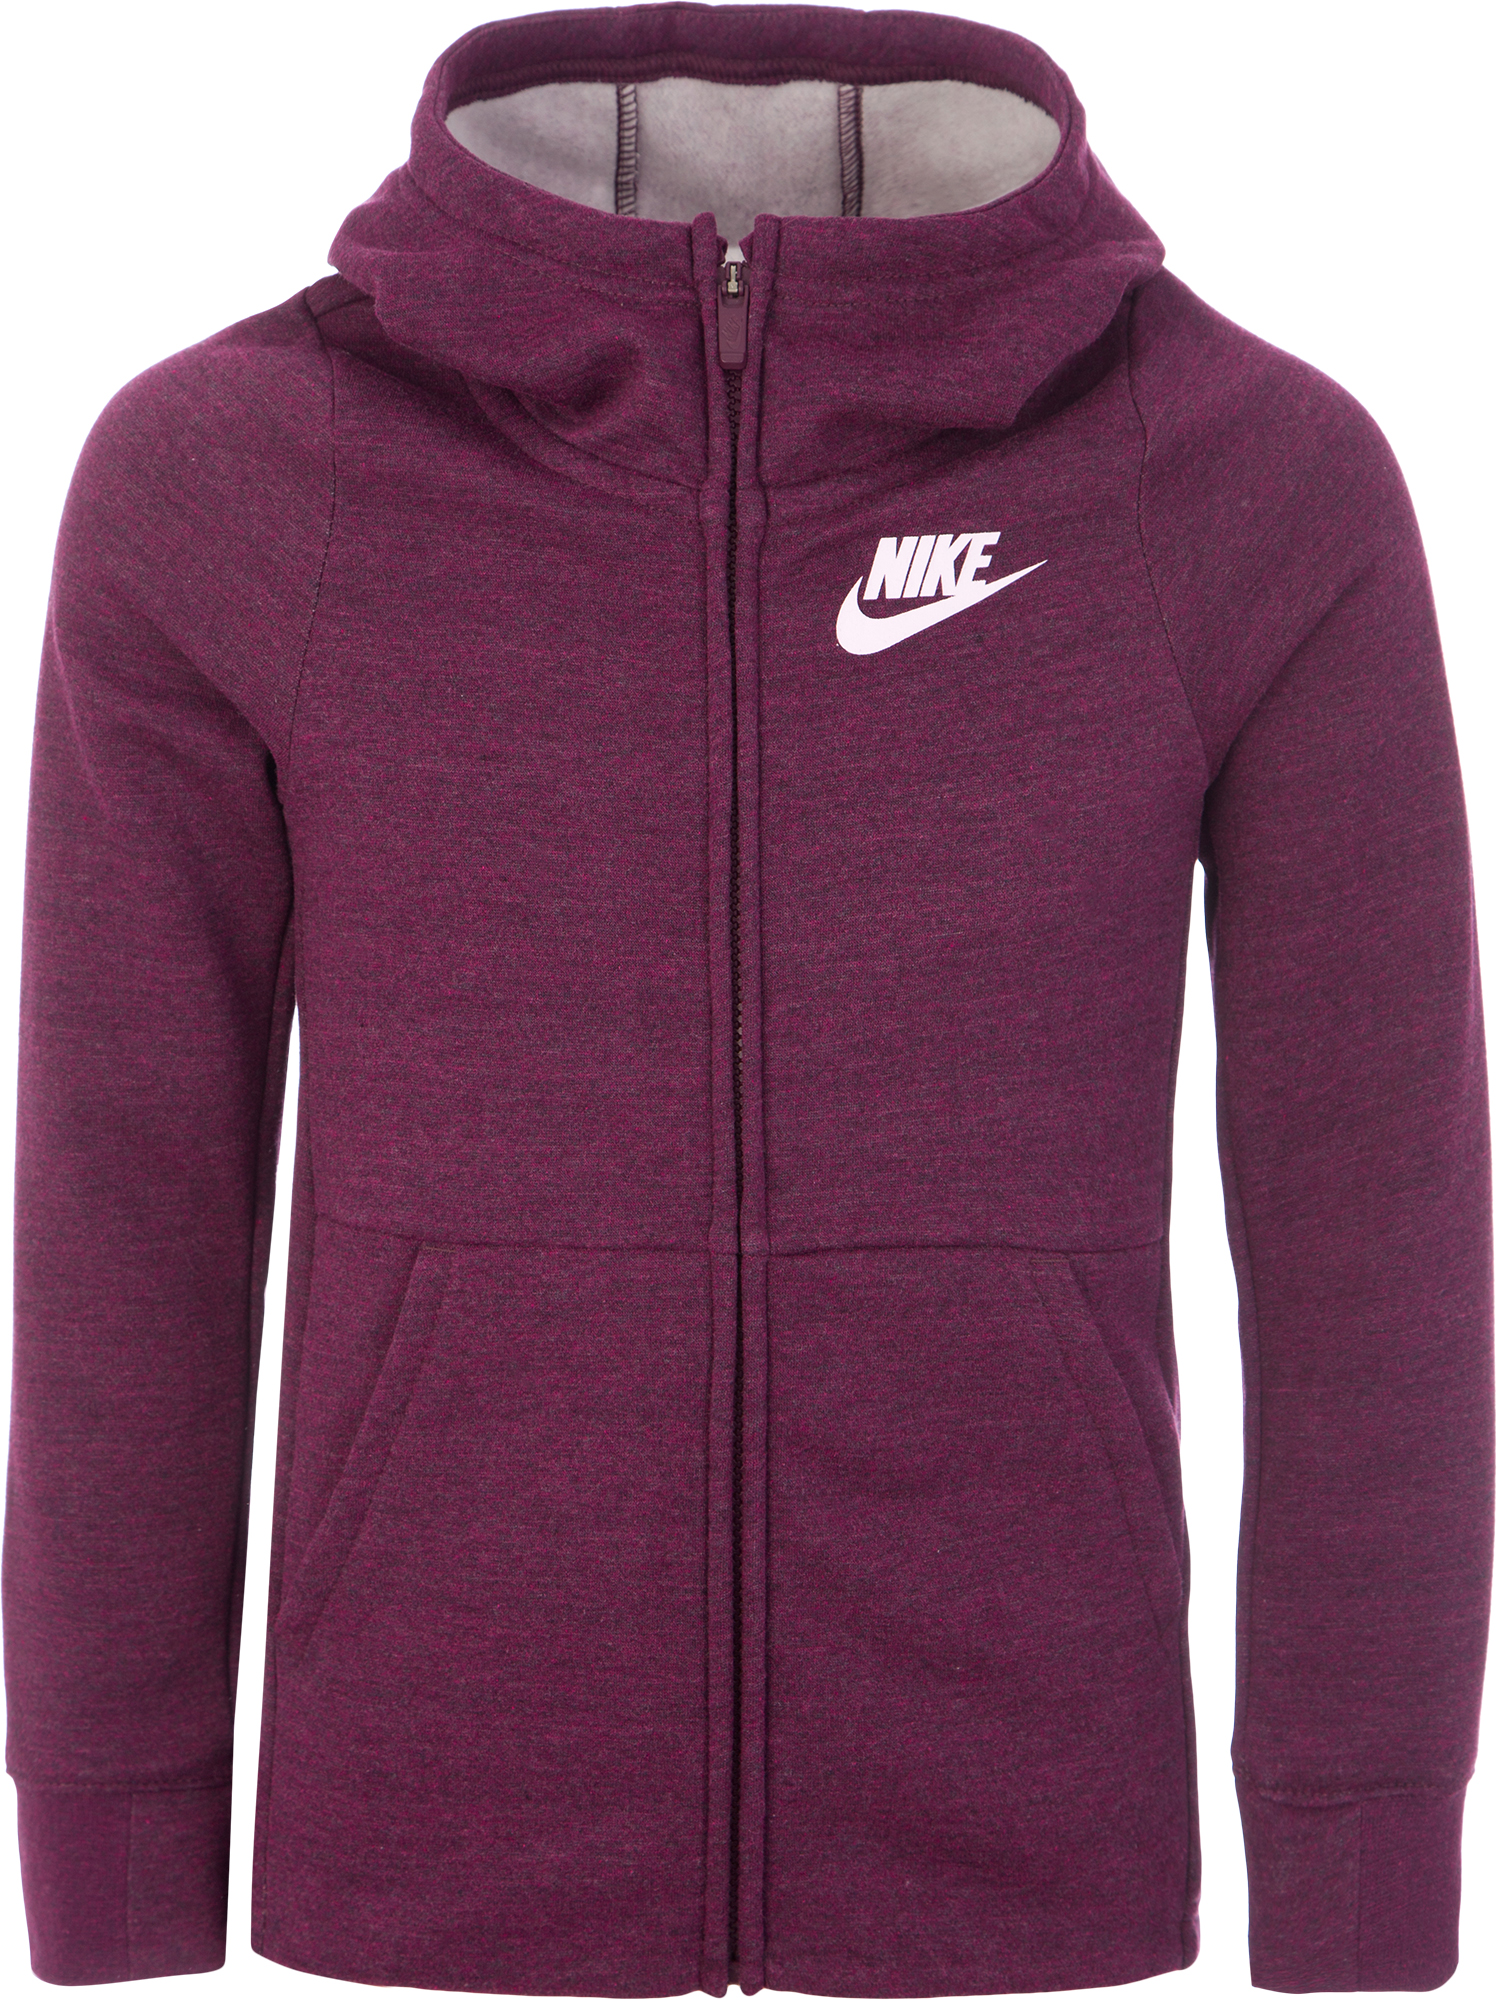 Nike Джемпер для девочек Nike Sportswear, размер 156-164